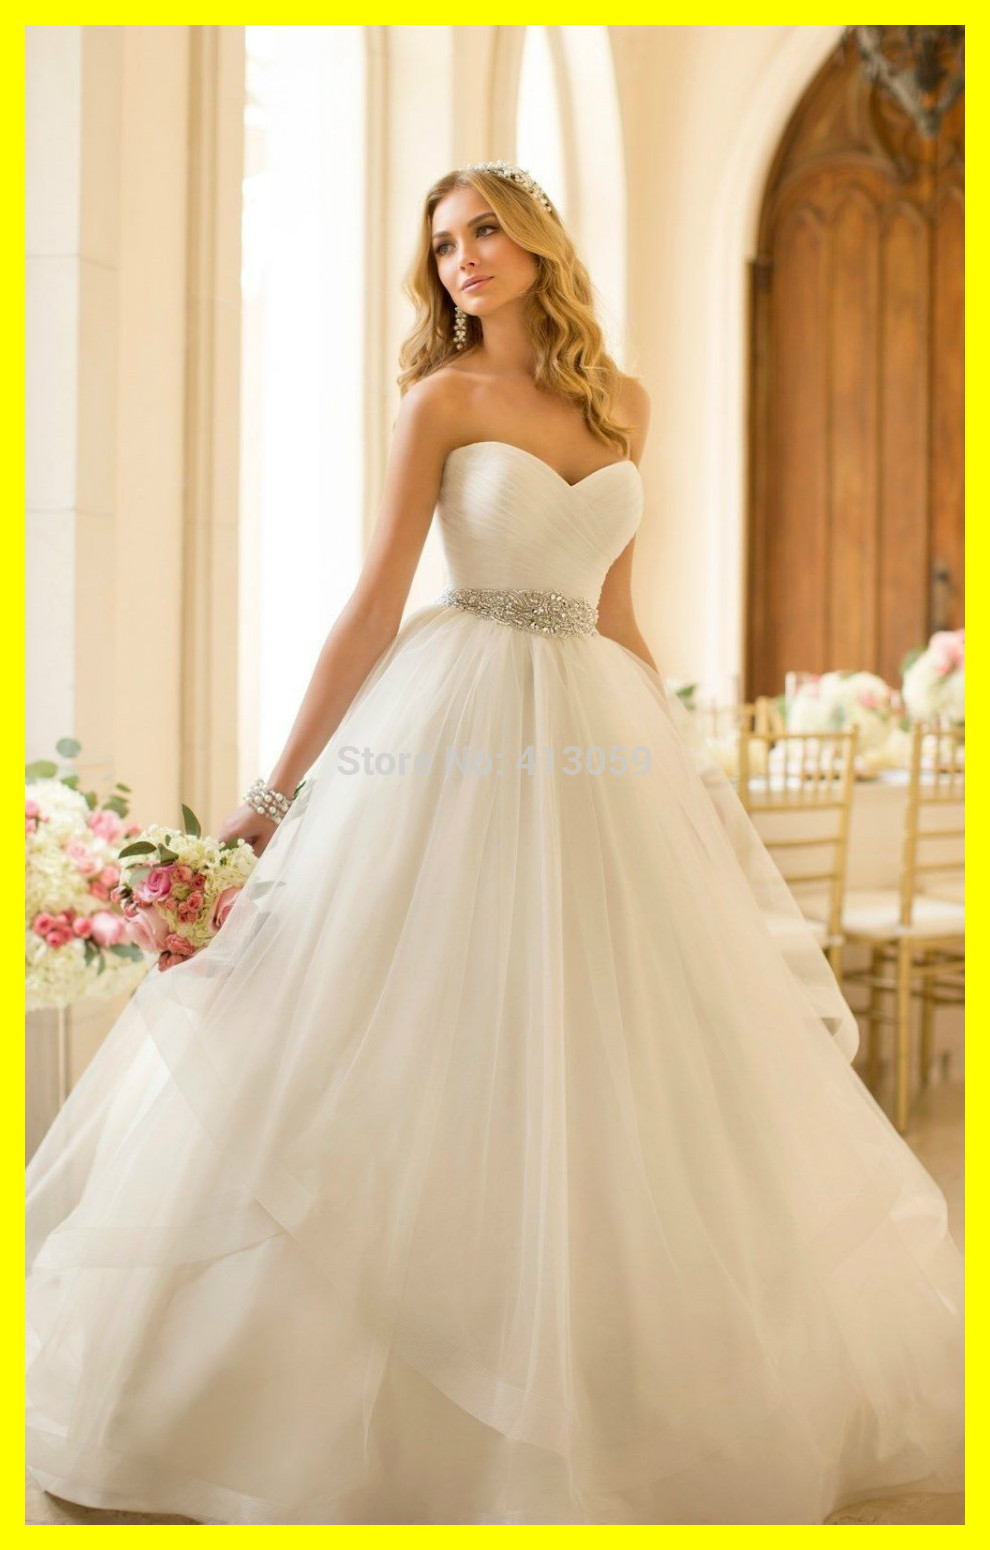 Fullsize Of Flowy Wedding Dress